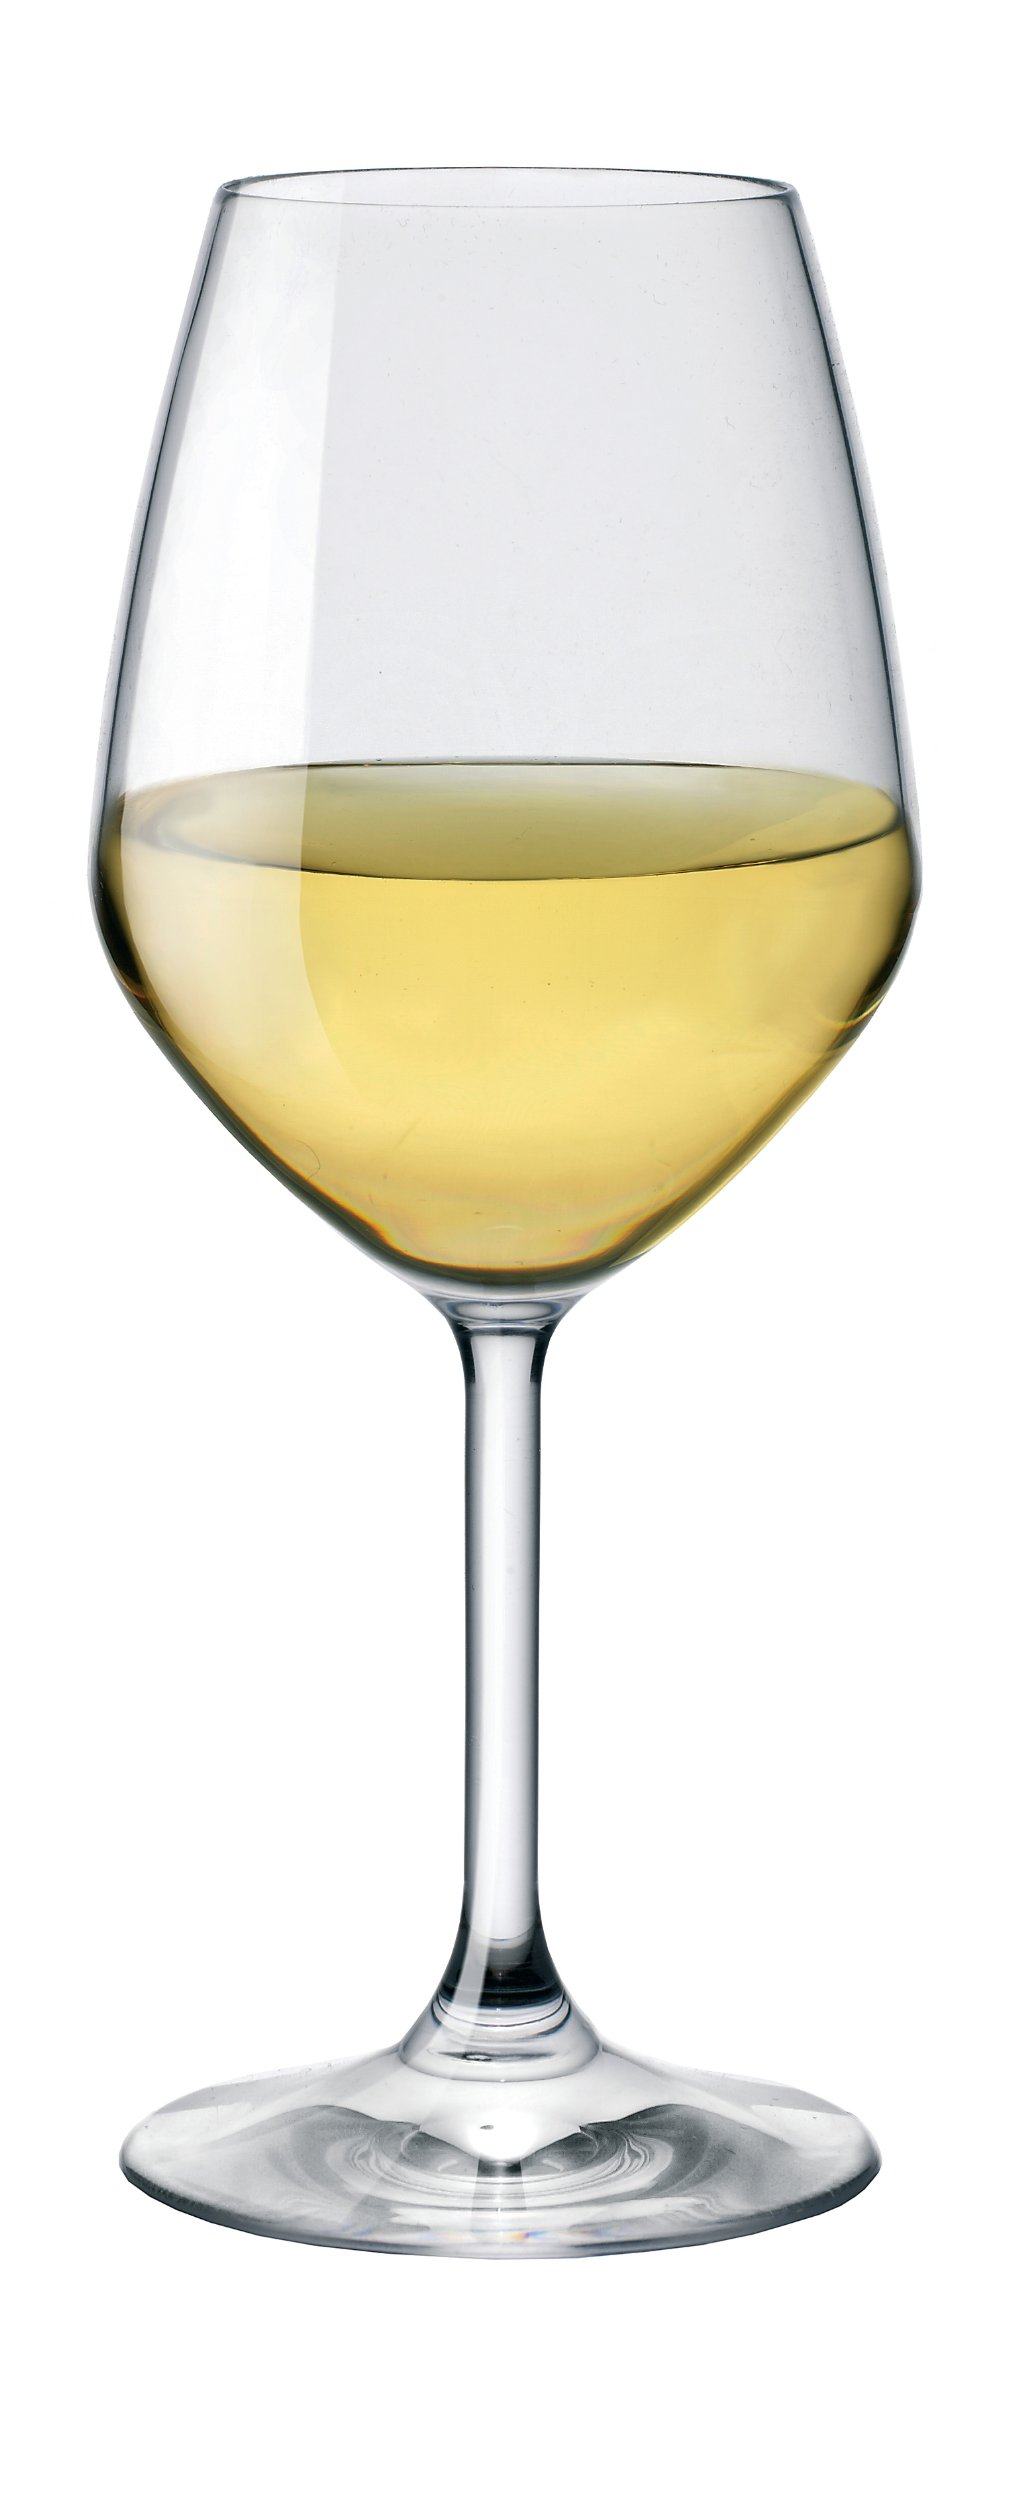 Bormioli Rocco Restaurant White Wine Glass, Set of 4